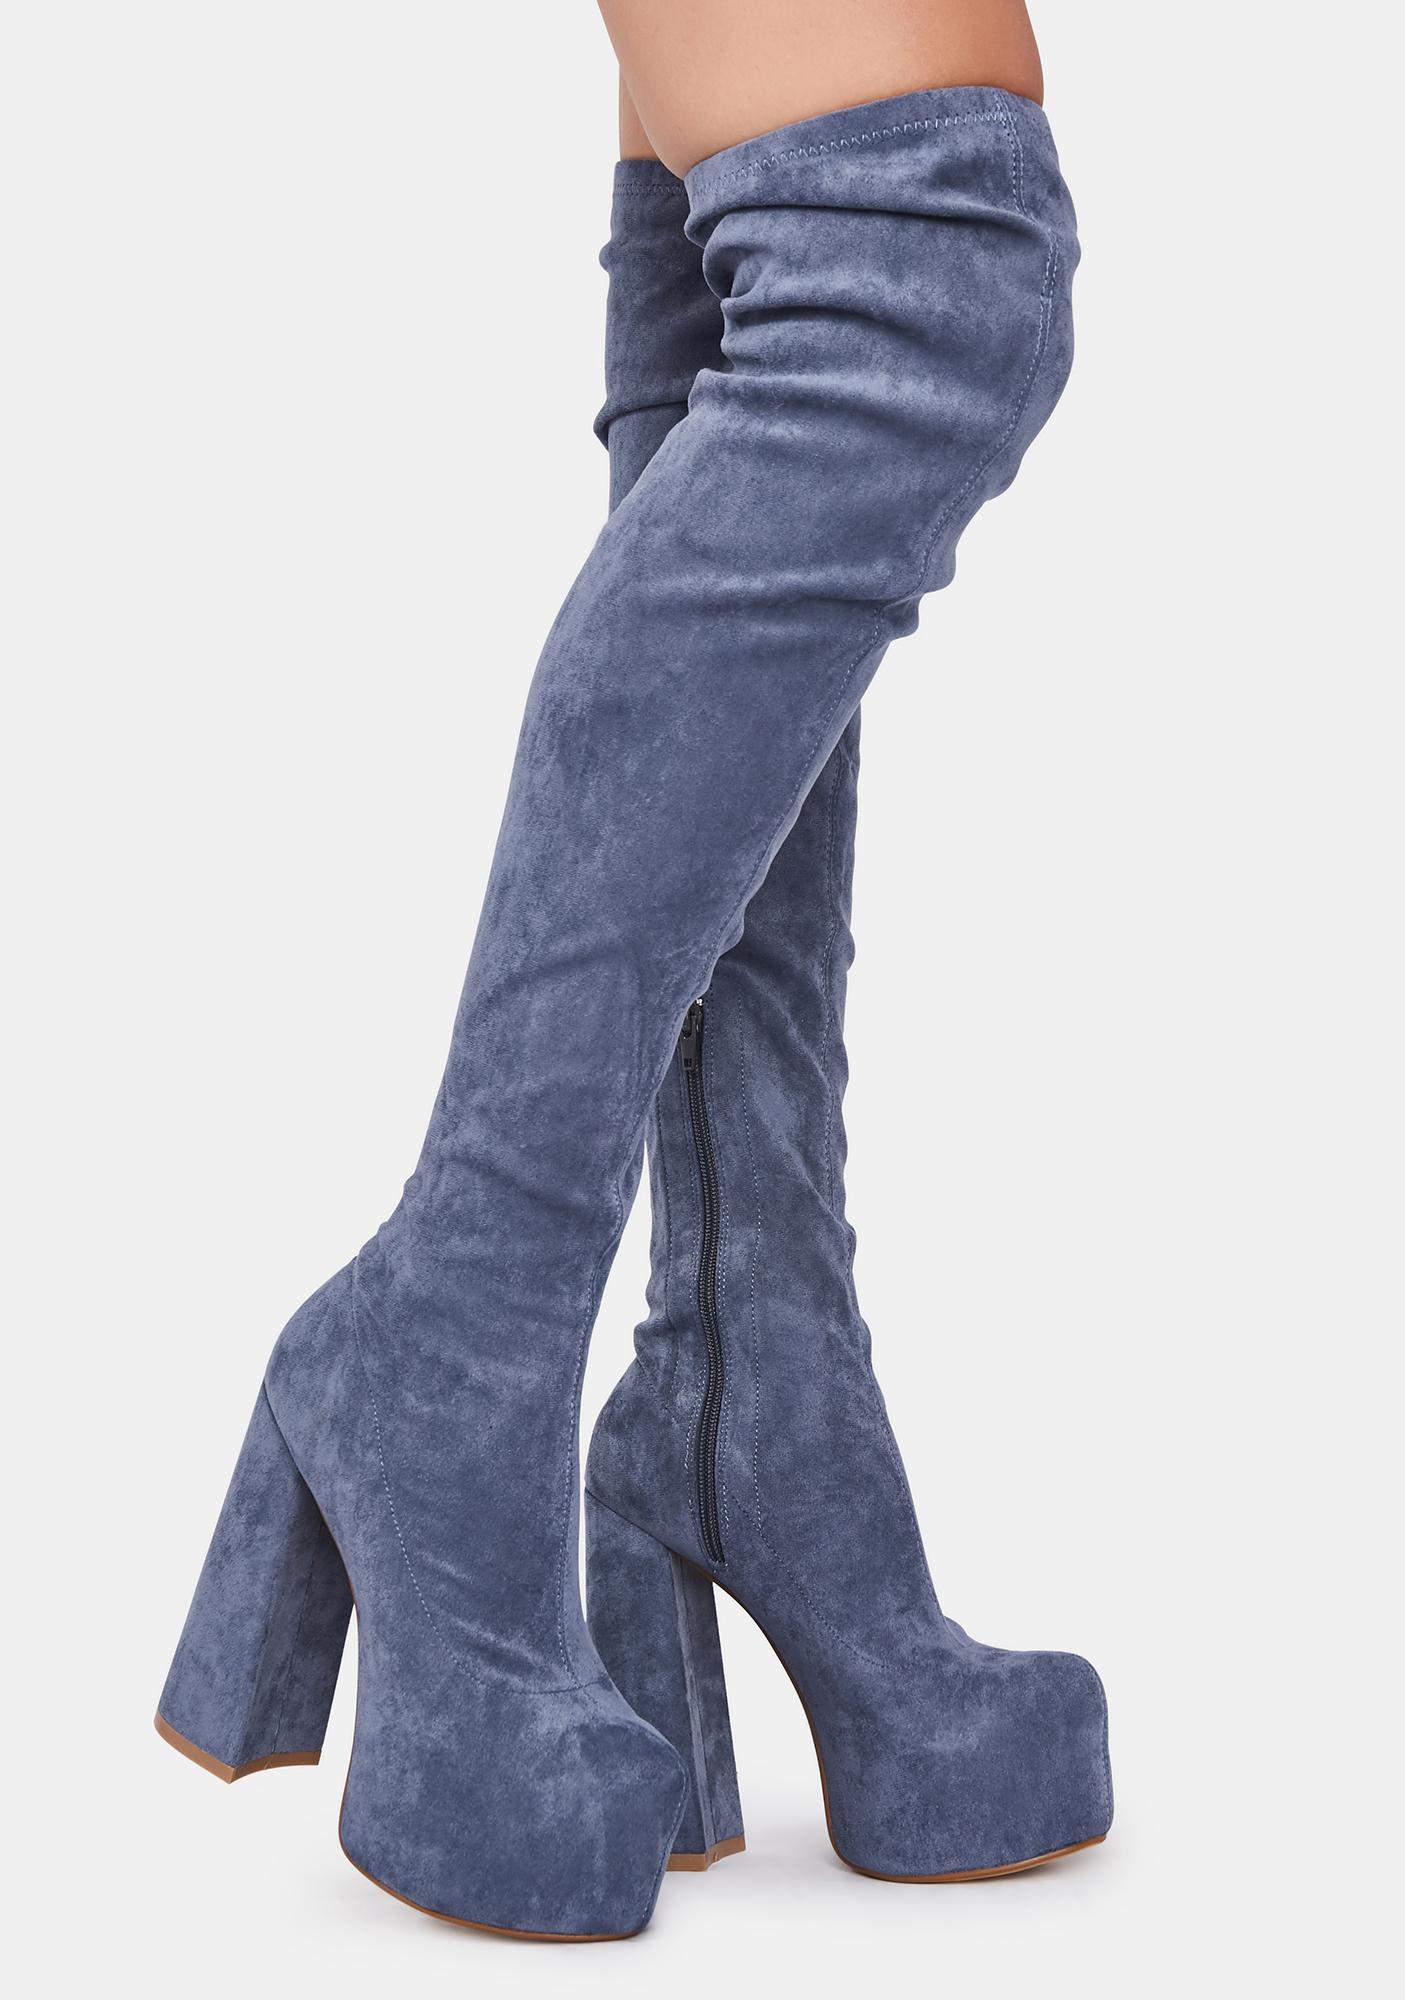 Lemon Drop by Privileged Blue Havasu Knee High Boots